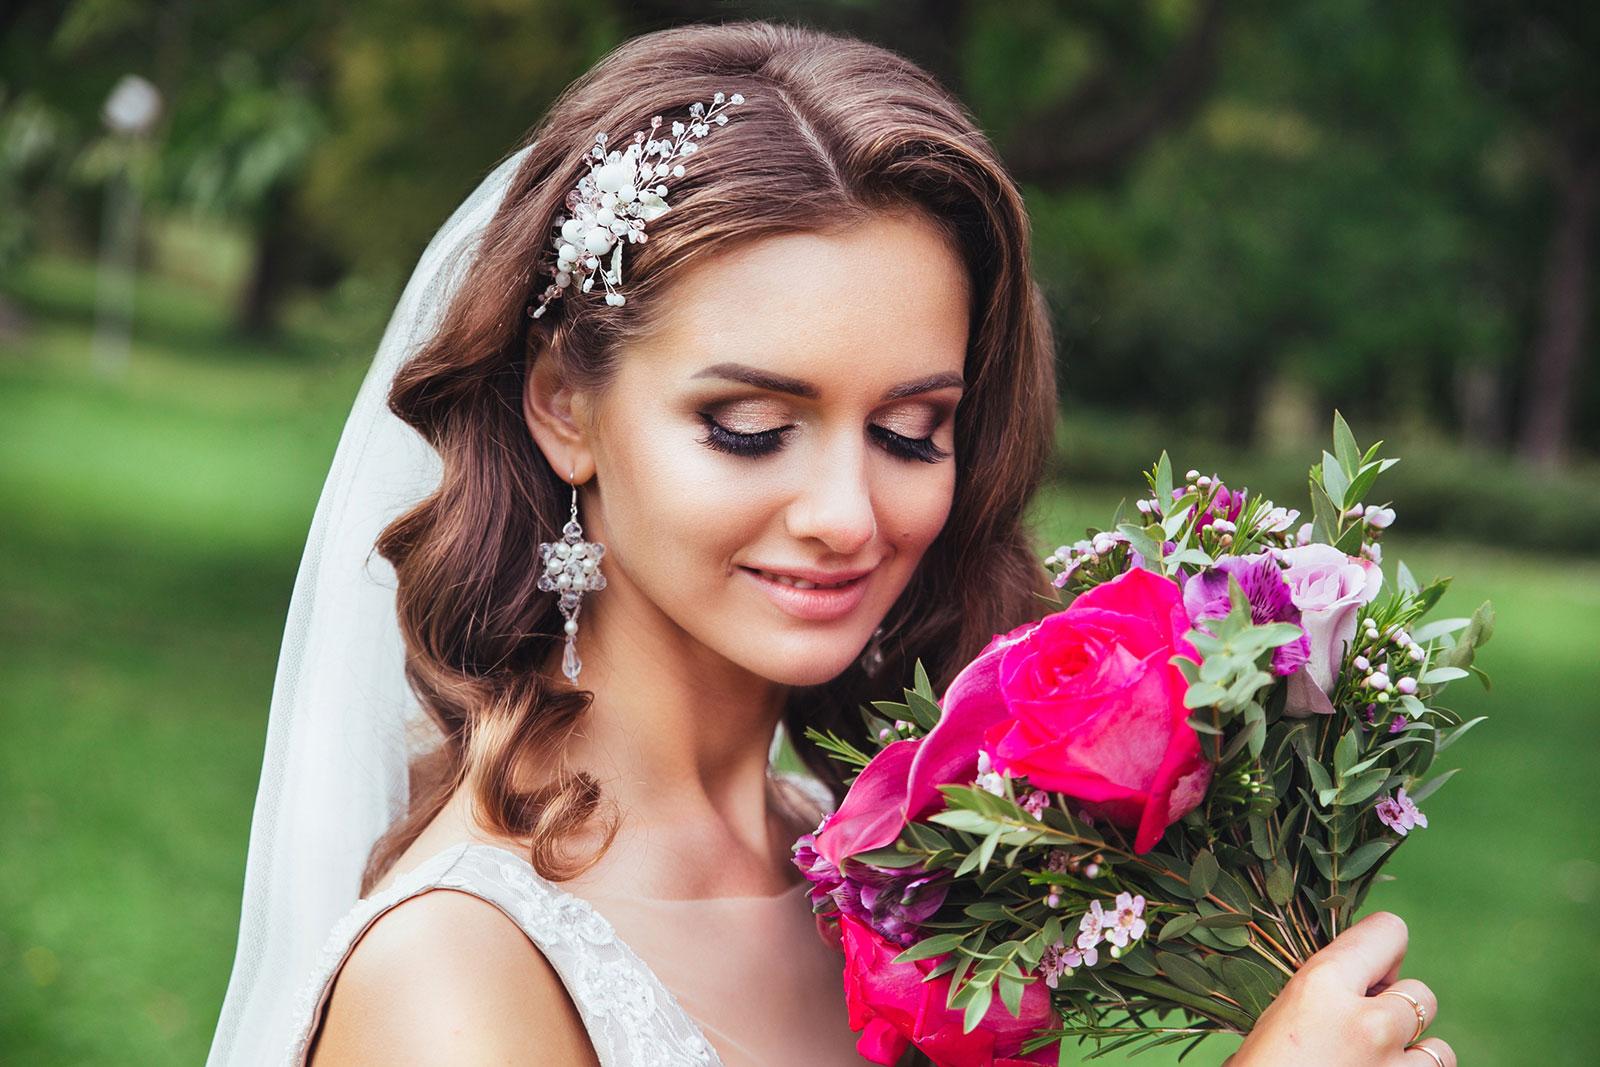 Glowing Cheeks & Outdoor Eyes Wedding Makeup